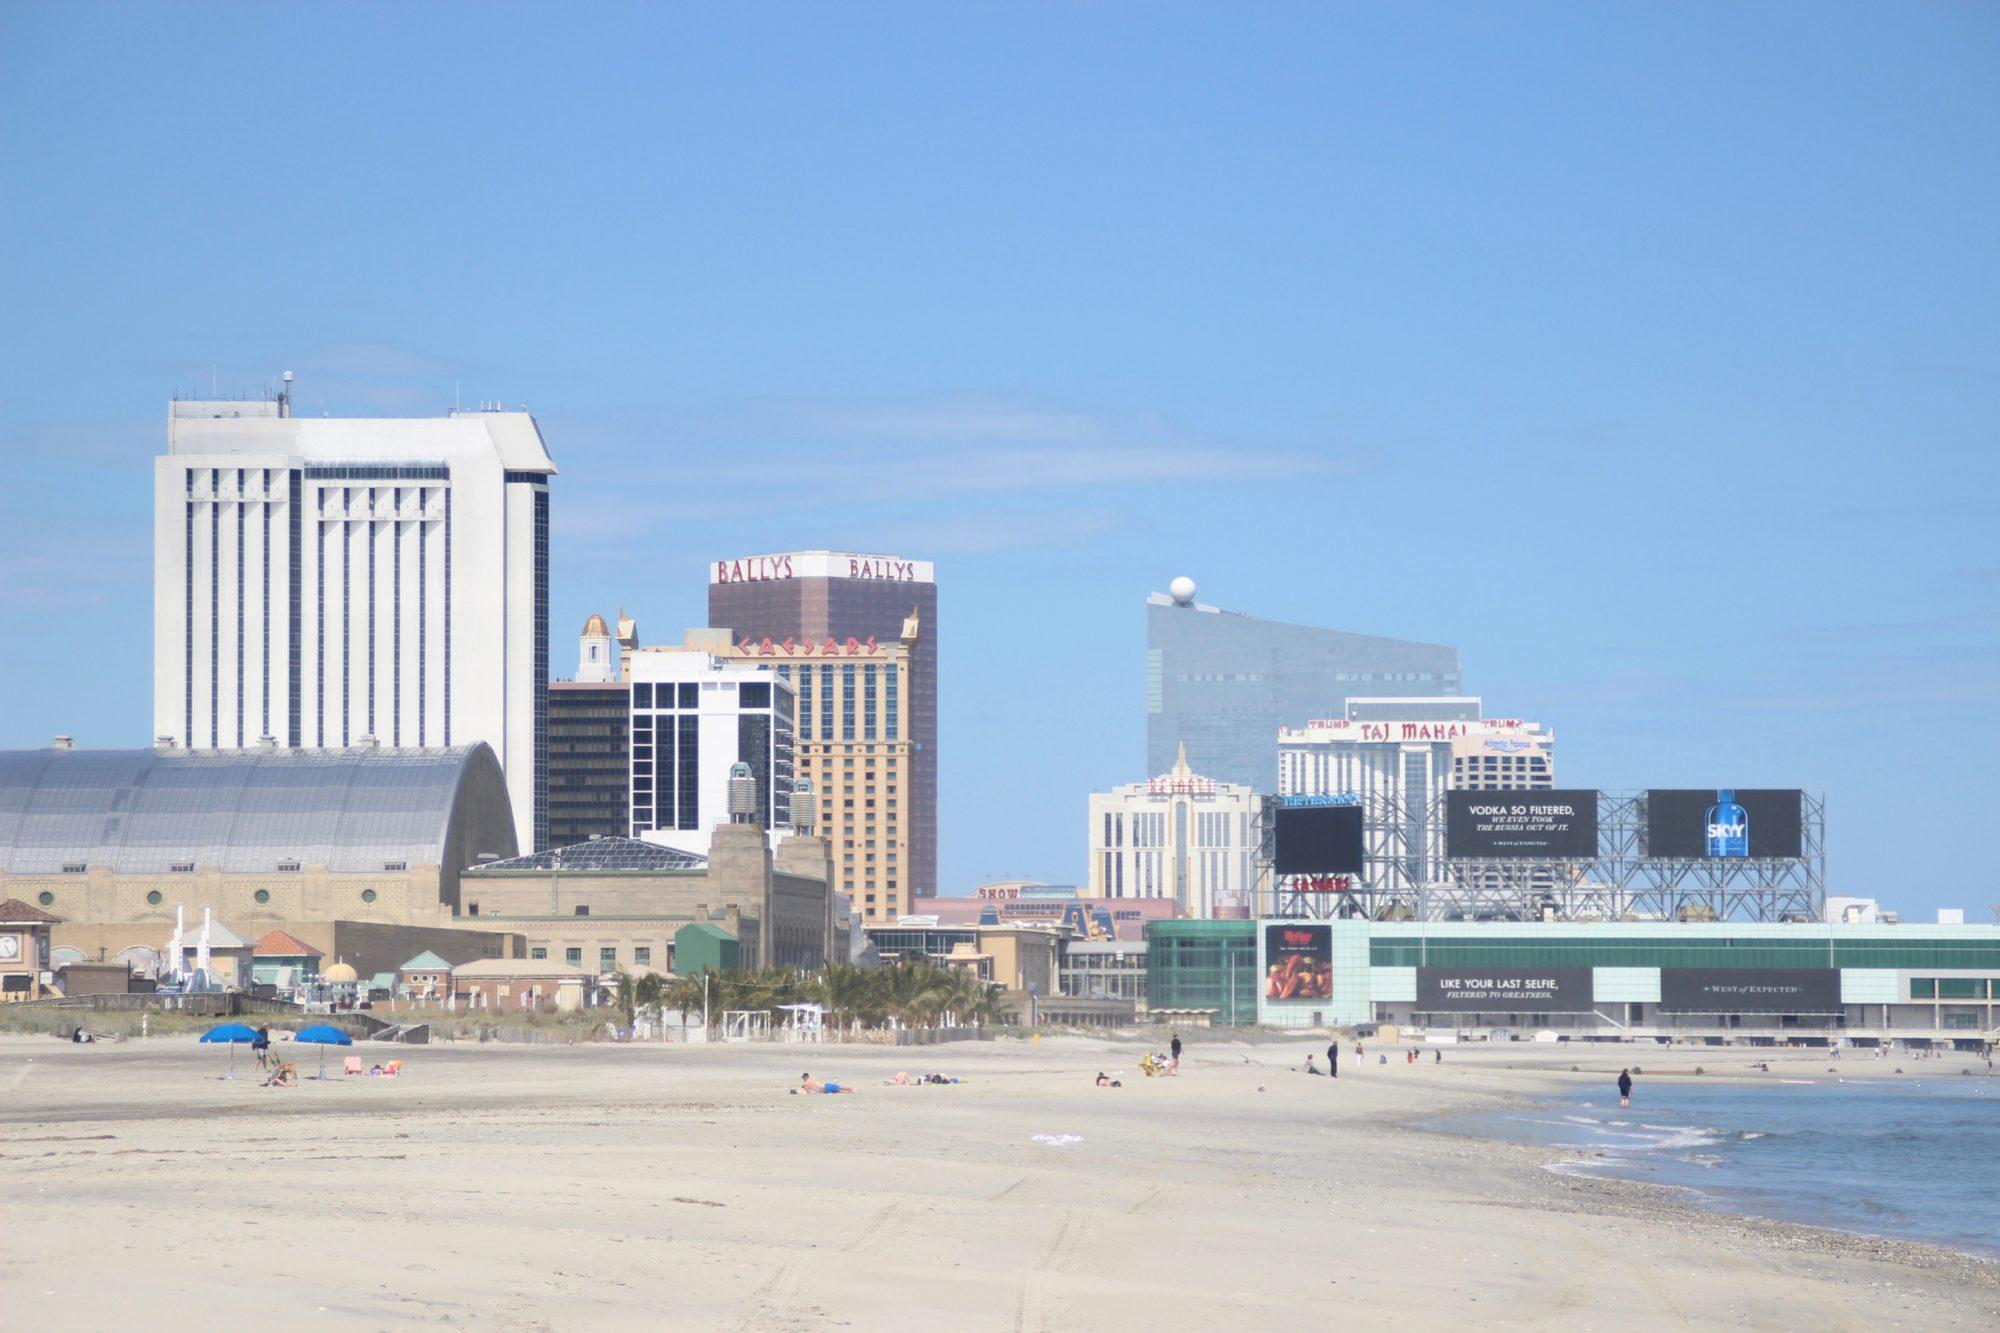 Город-призрак. Атлантик-Сити.